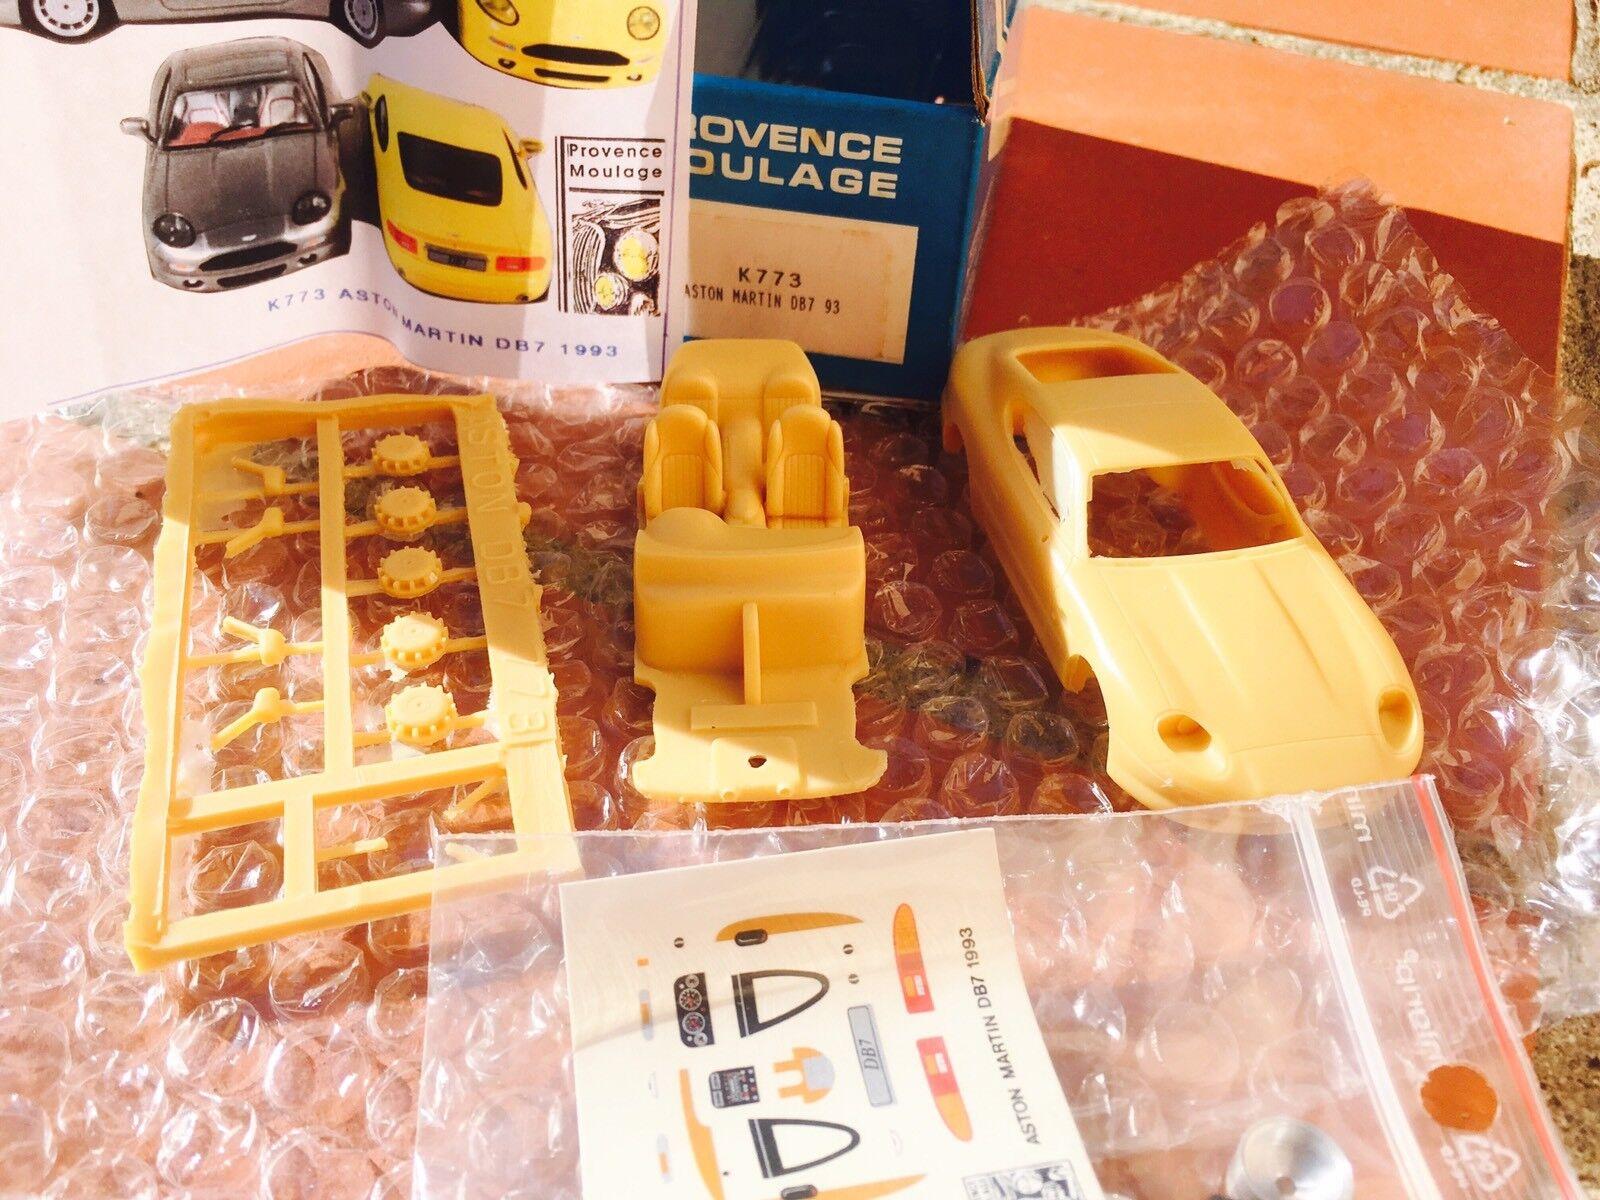 Provence moulage complete kit to mount 1 43 aston martin db7 93 k773